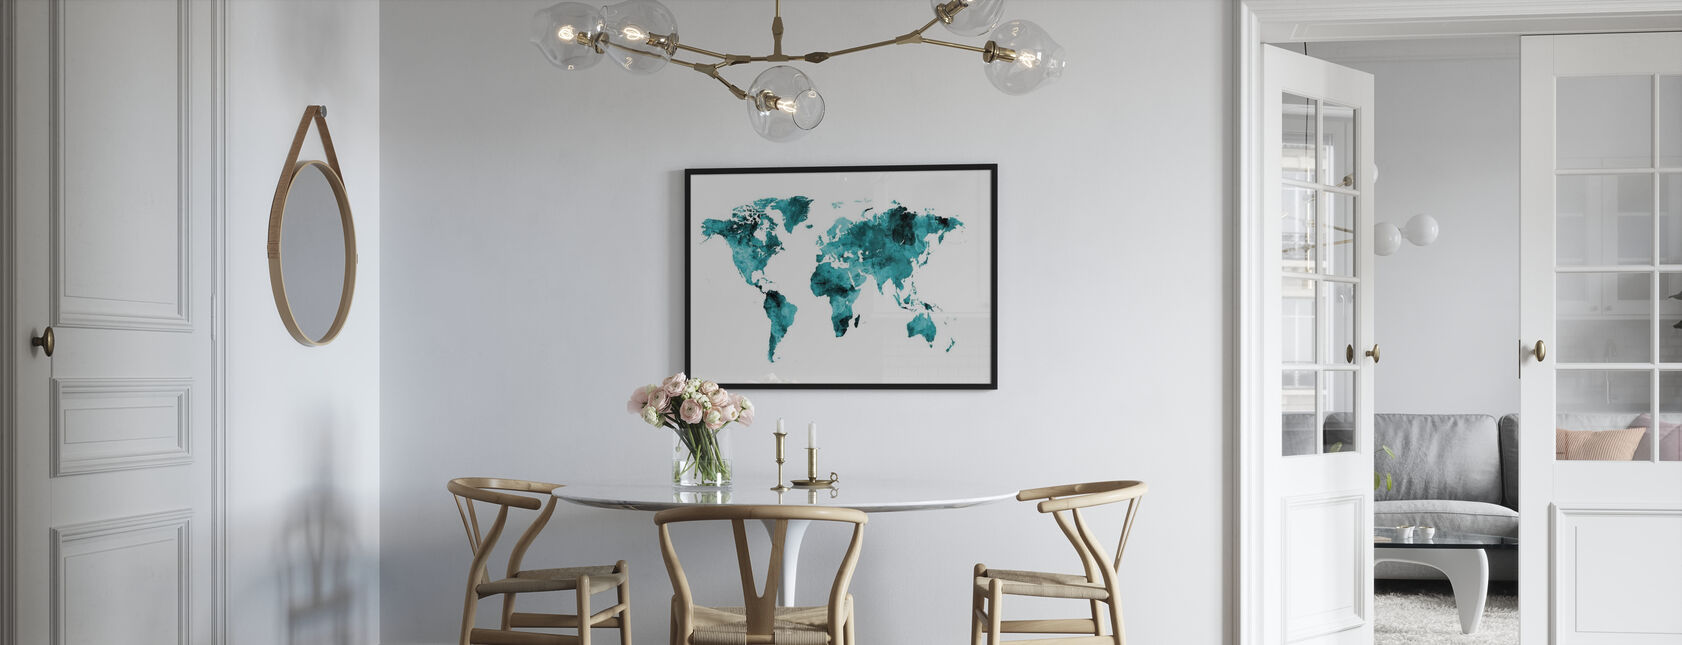 Aquarell Weltkarte Türkis - Poster - Küchen